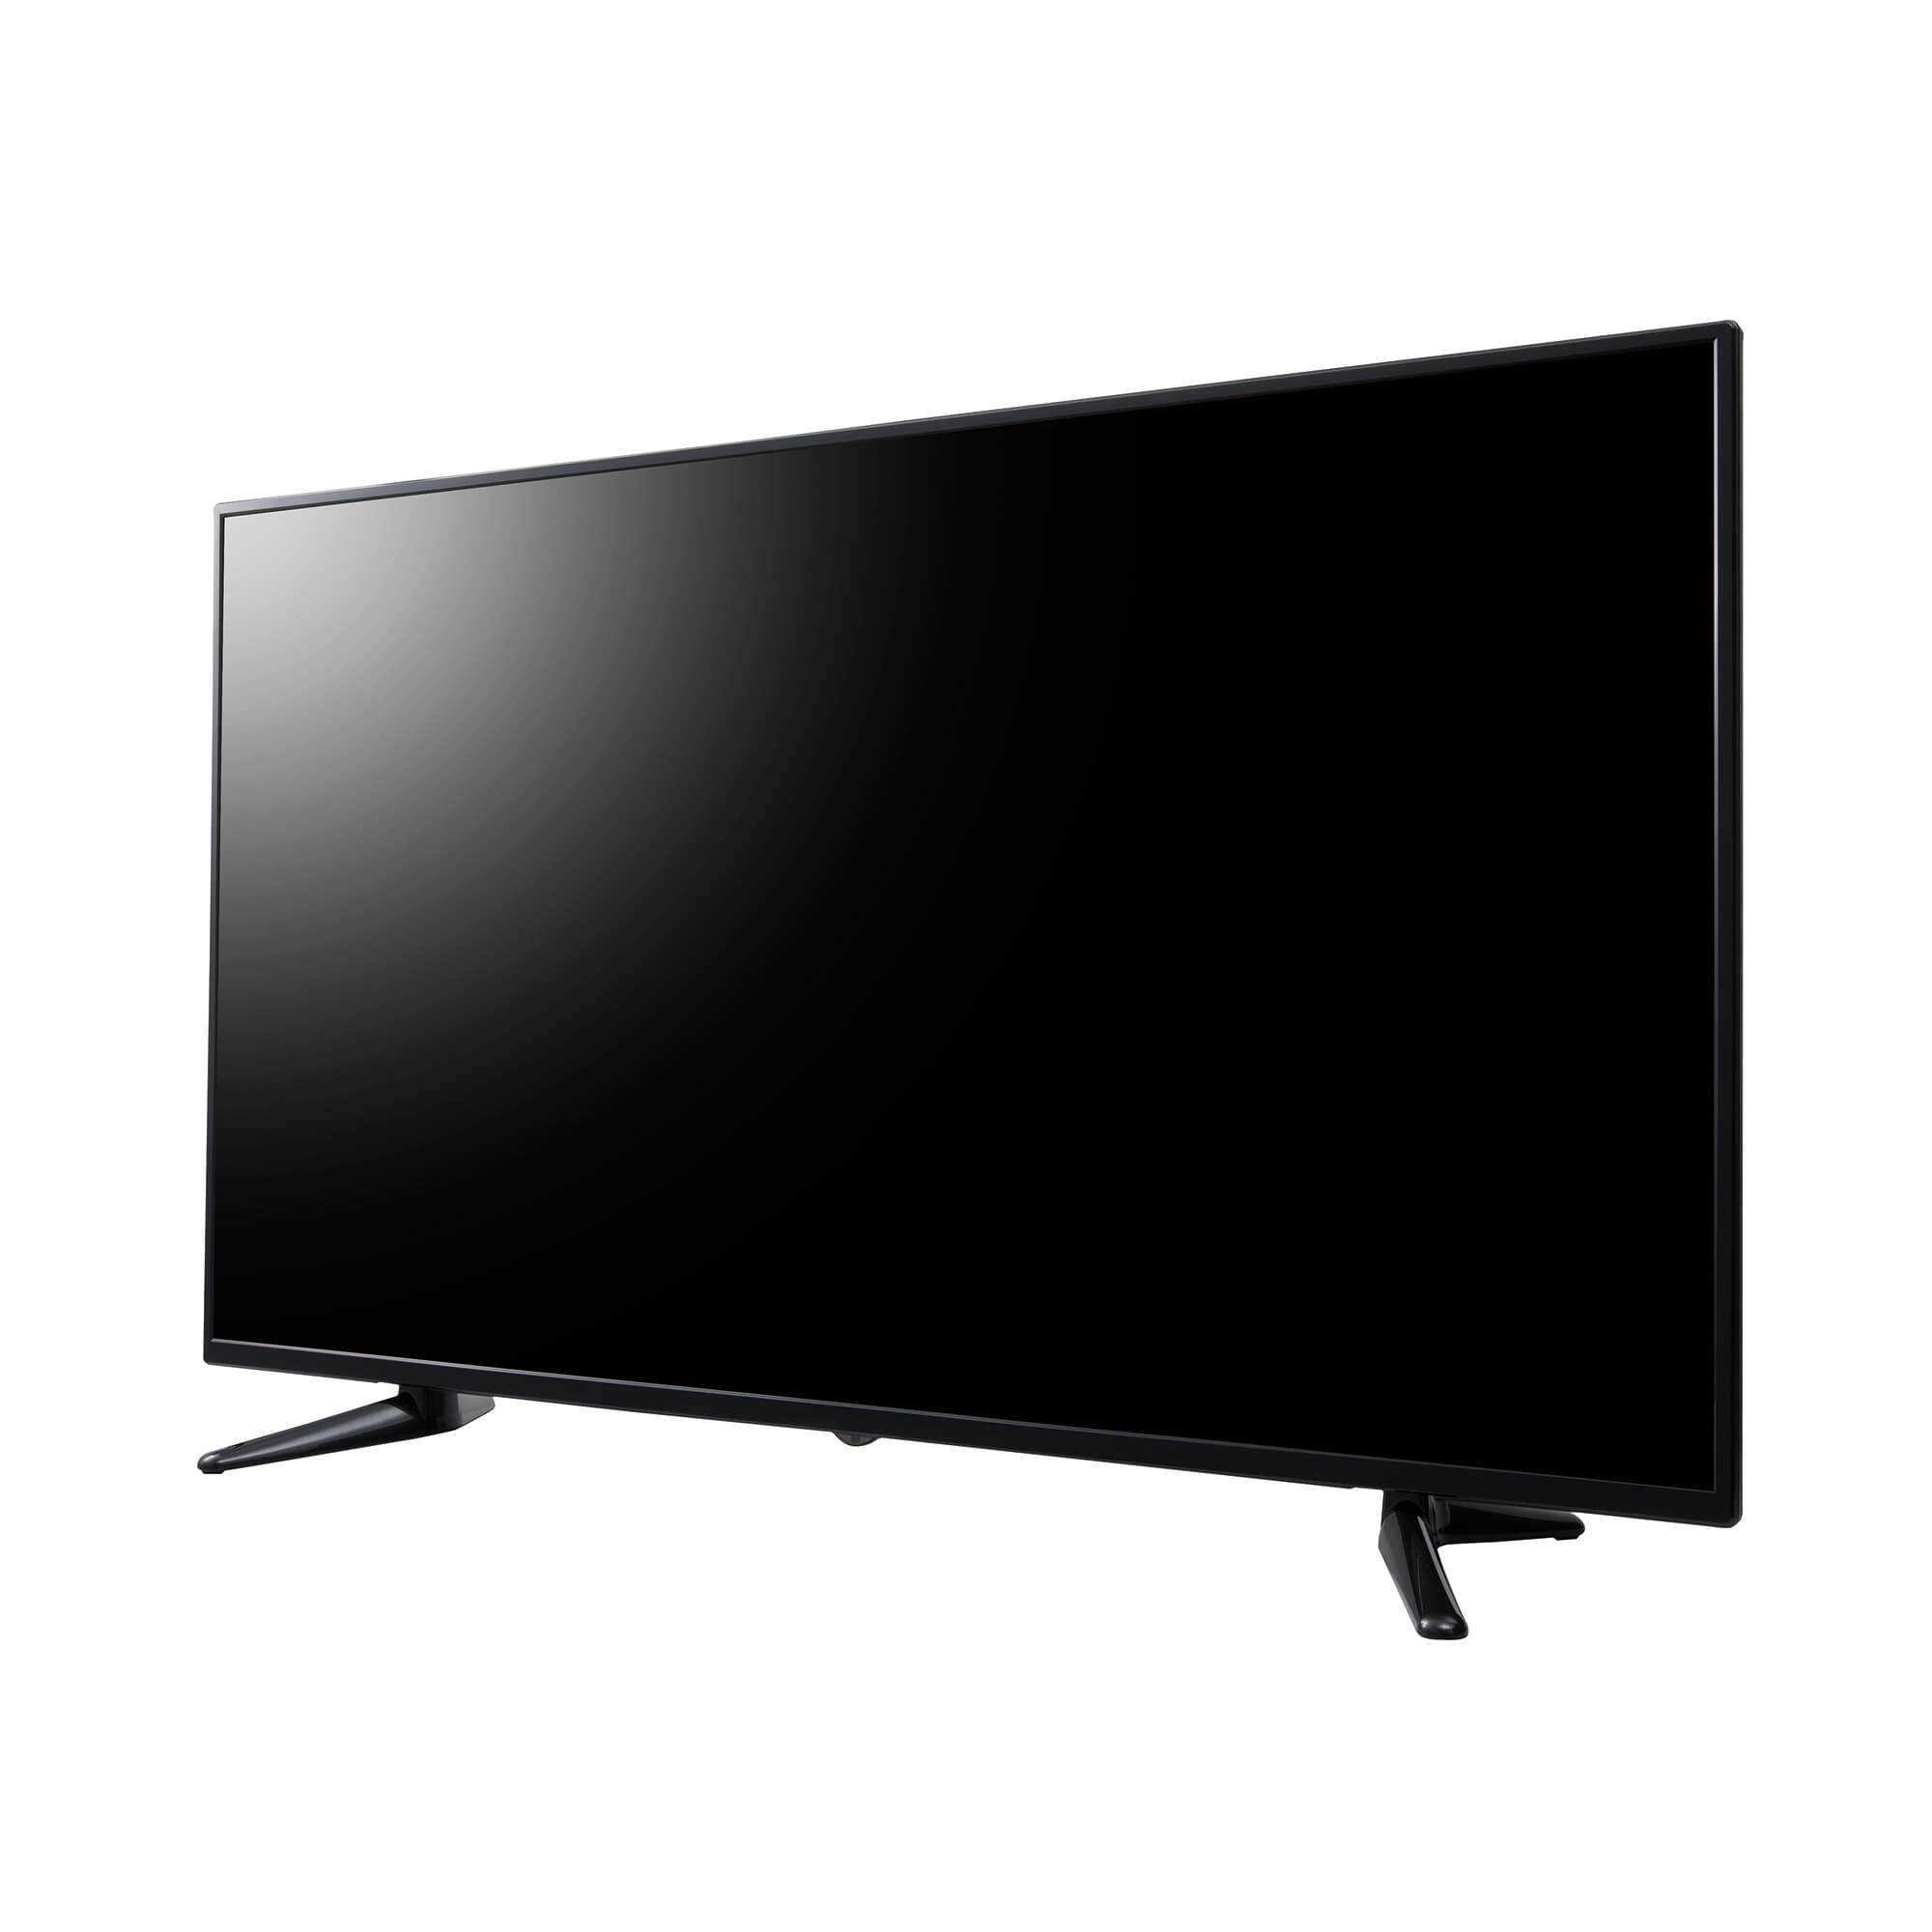 GH-TV55C-BK